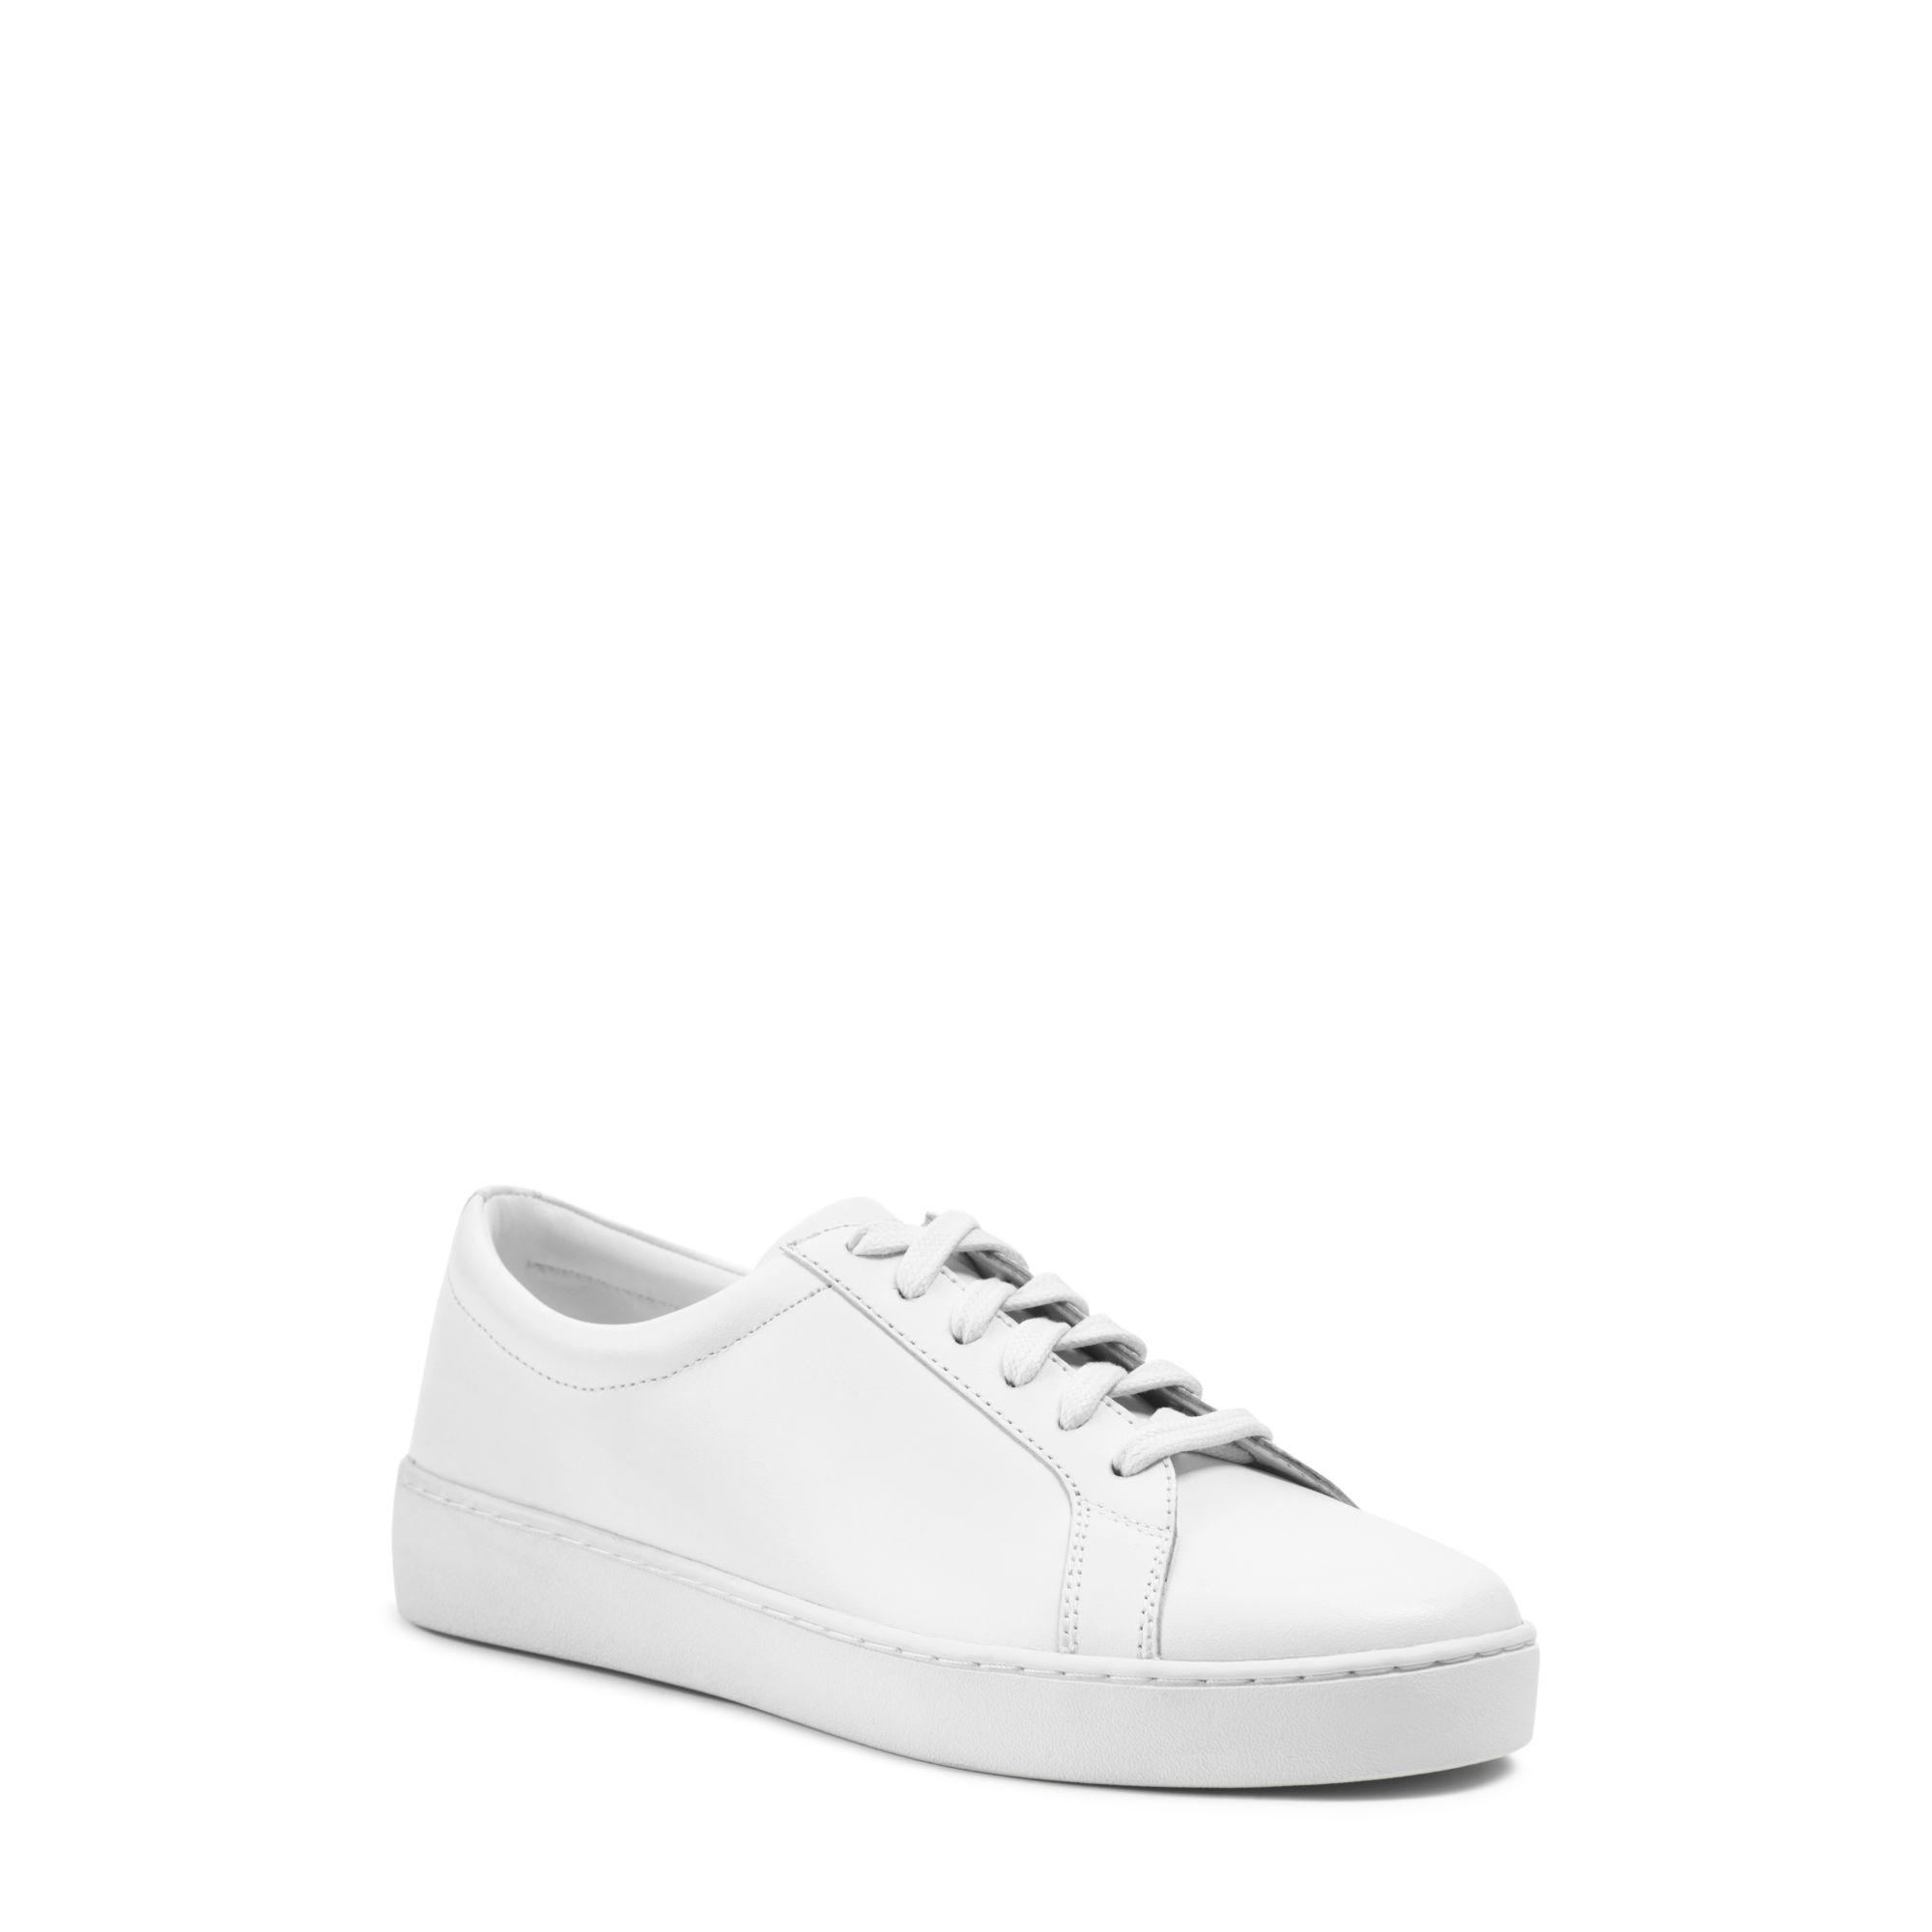 michael kors valin vachetta leather sneaker in white for. Black Bedroom Furniture Sets. Home Design Ideas